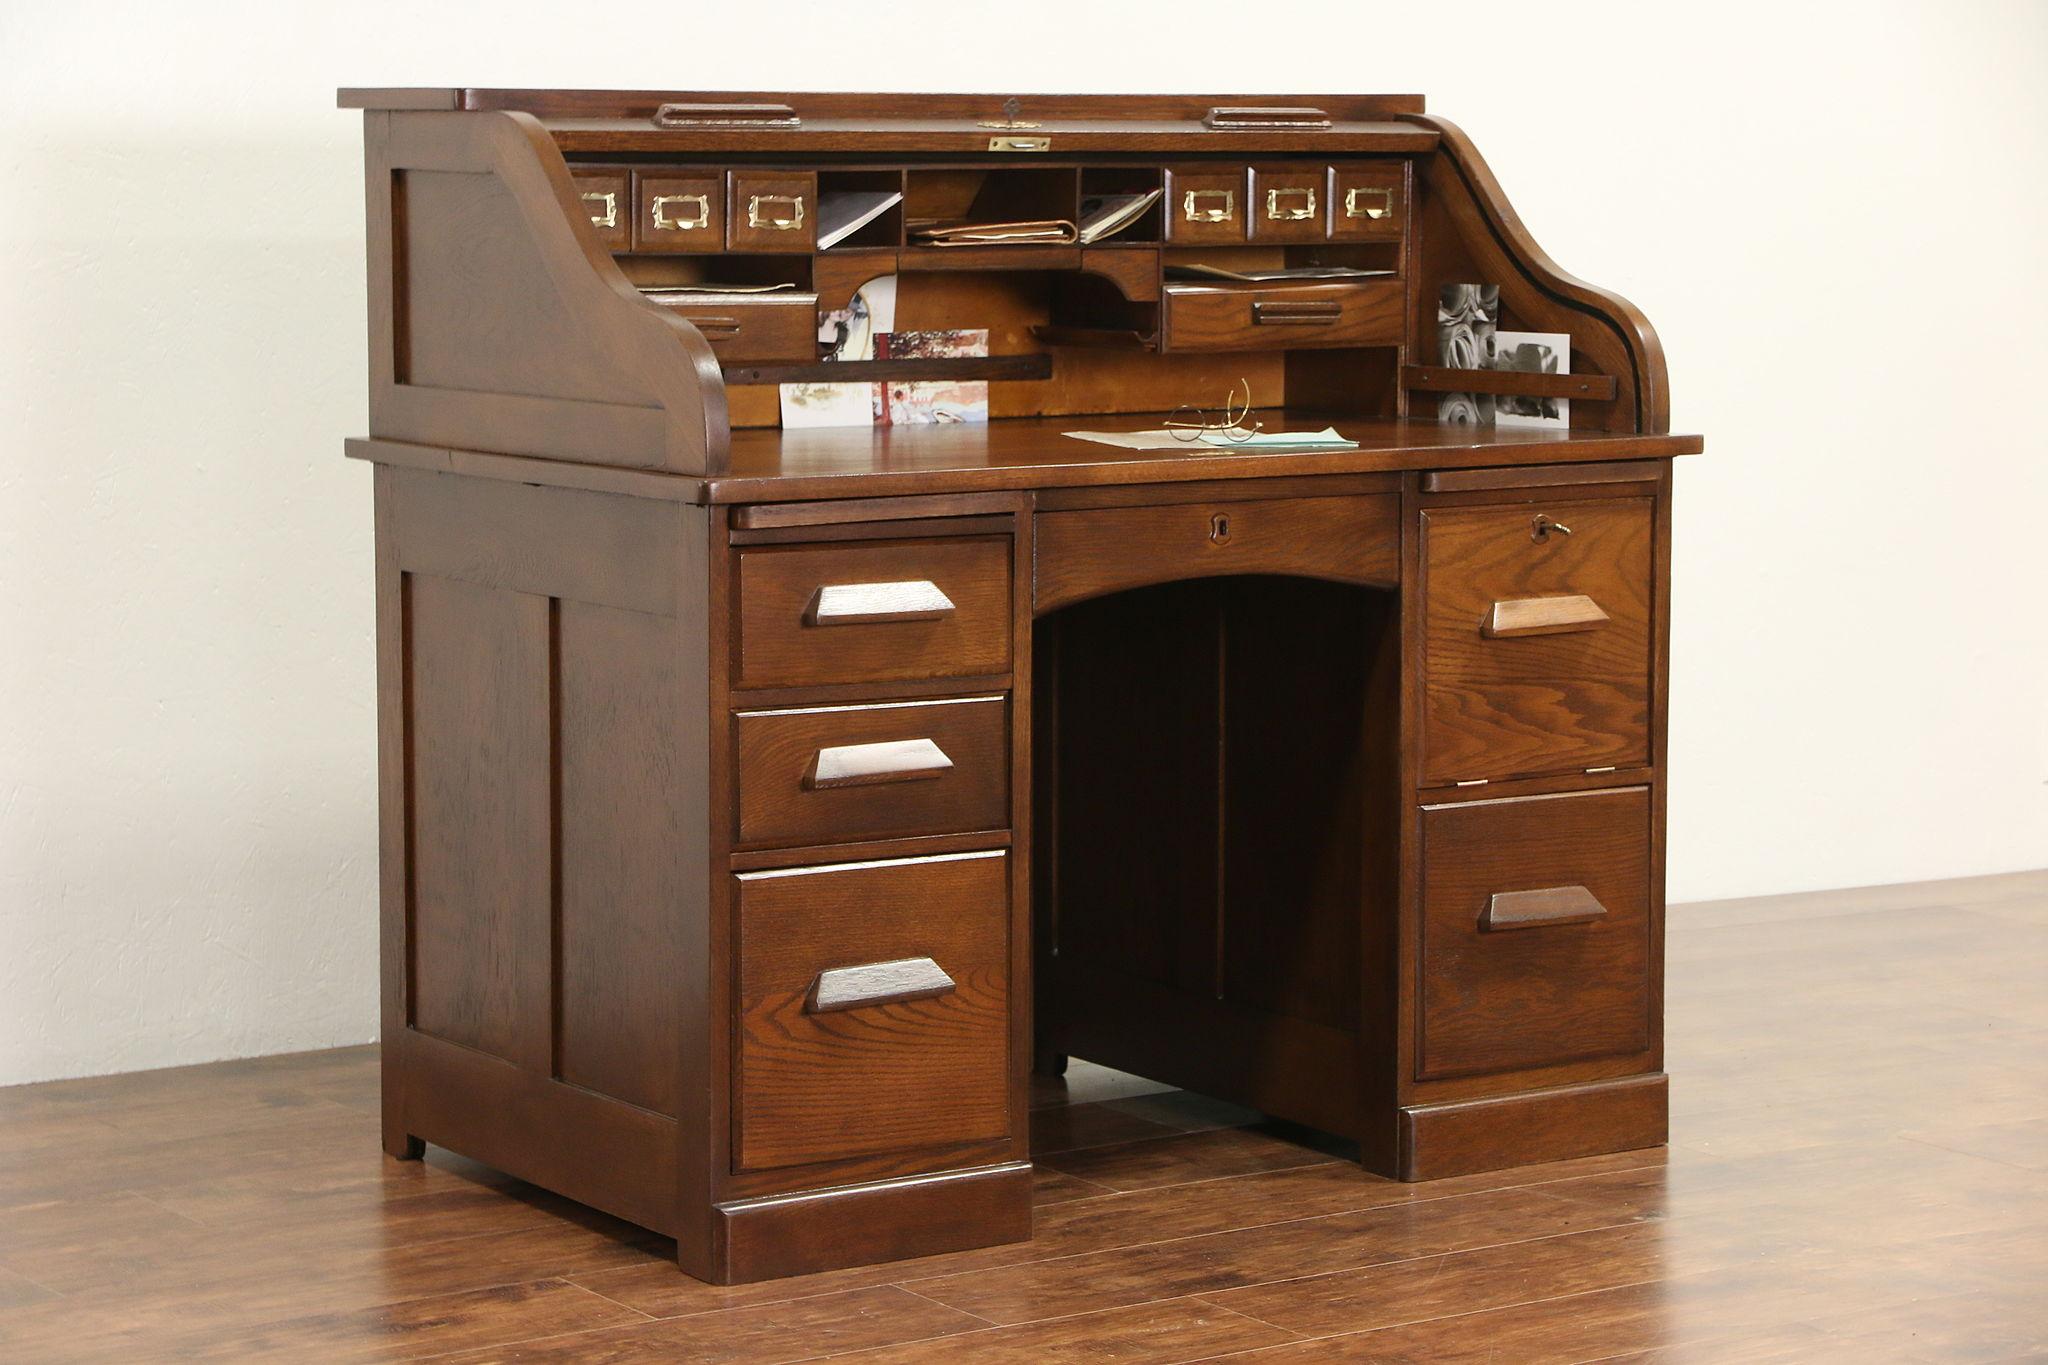 Oak 1900 Antique S Curve Roll Top Desk Locking File Compartment